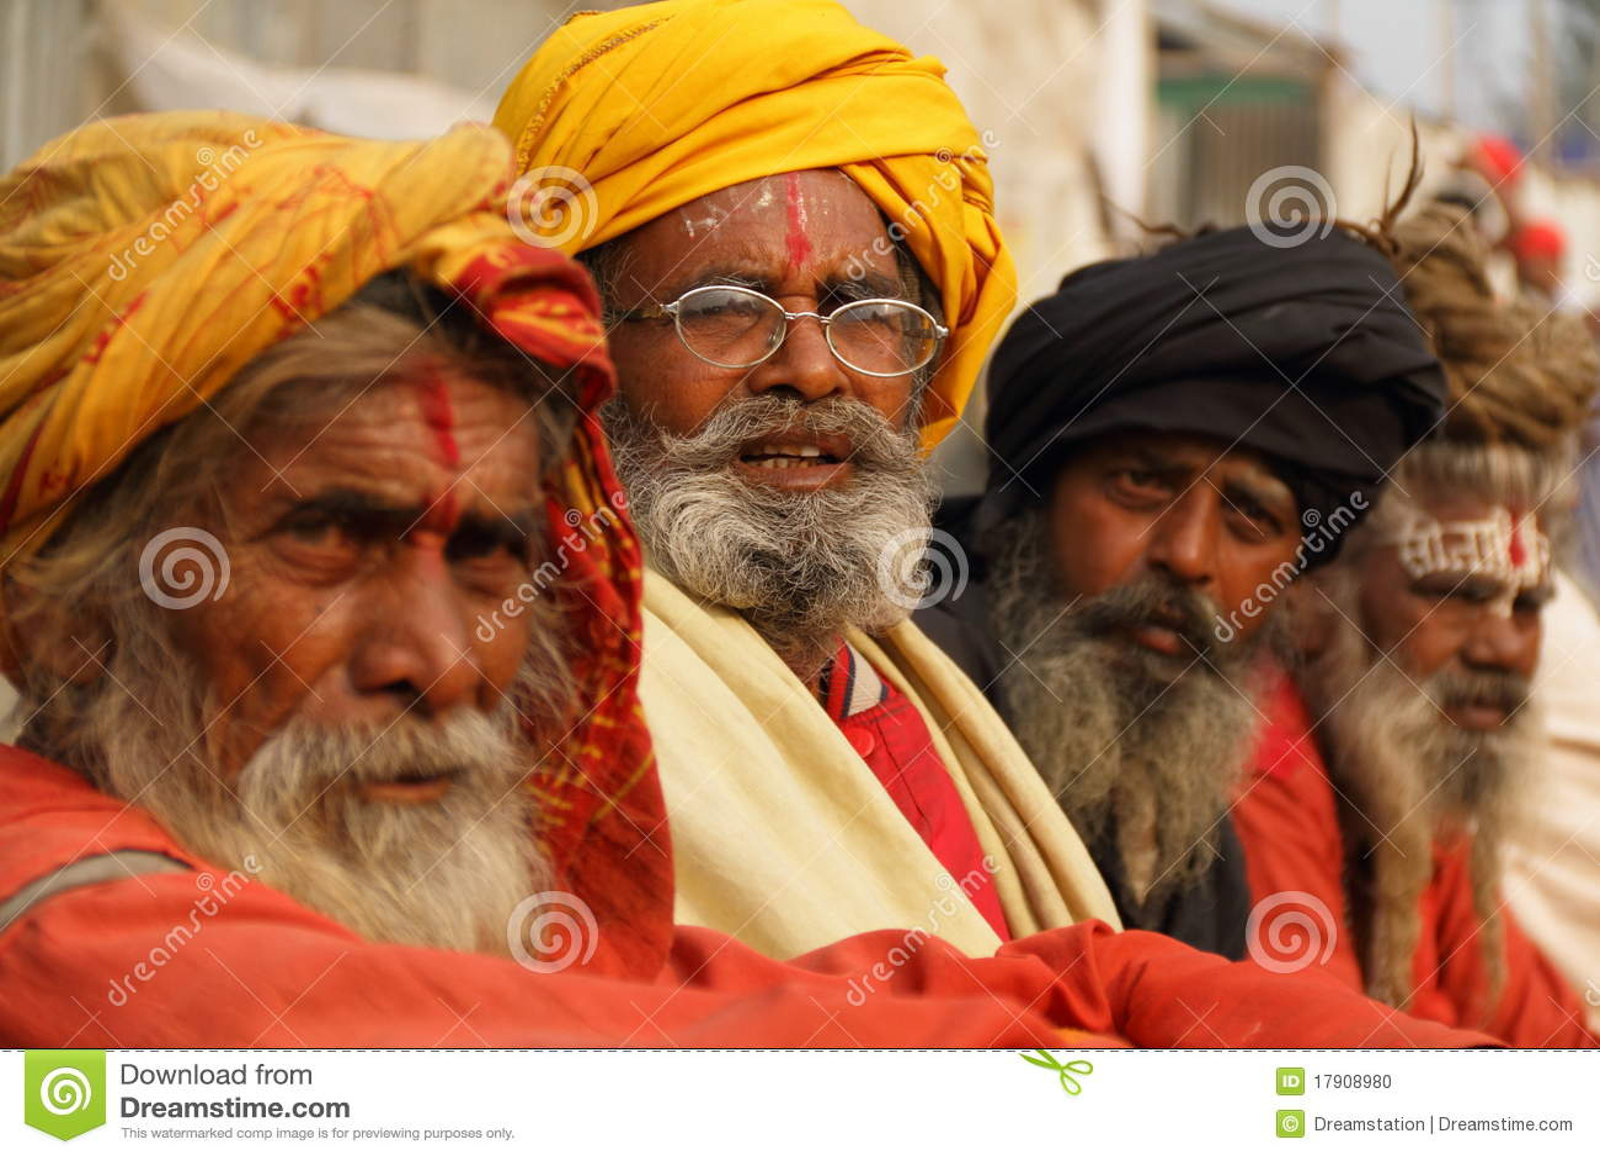 SADHUS, HEILIGE MENSEN VAN INDIA